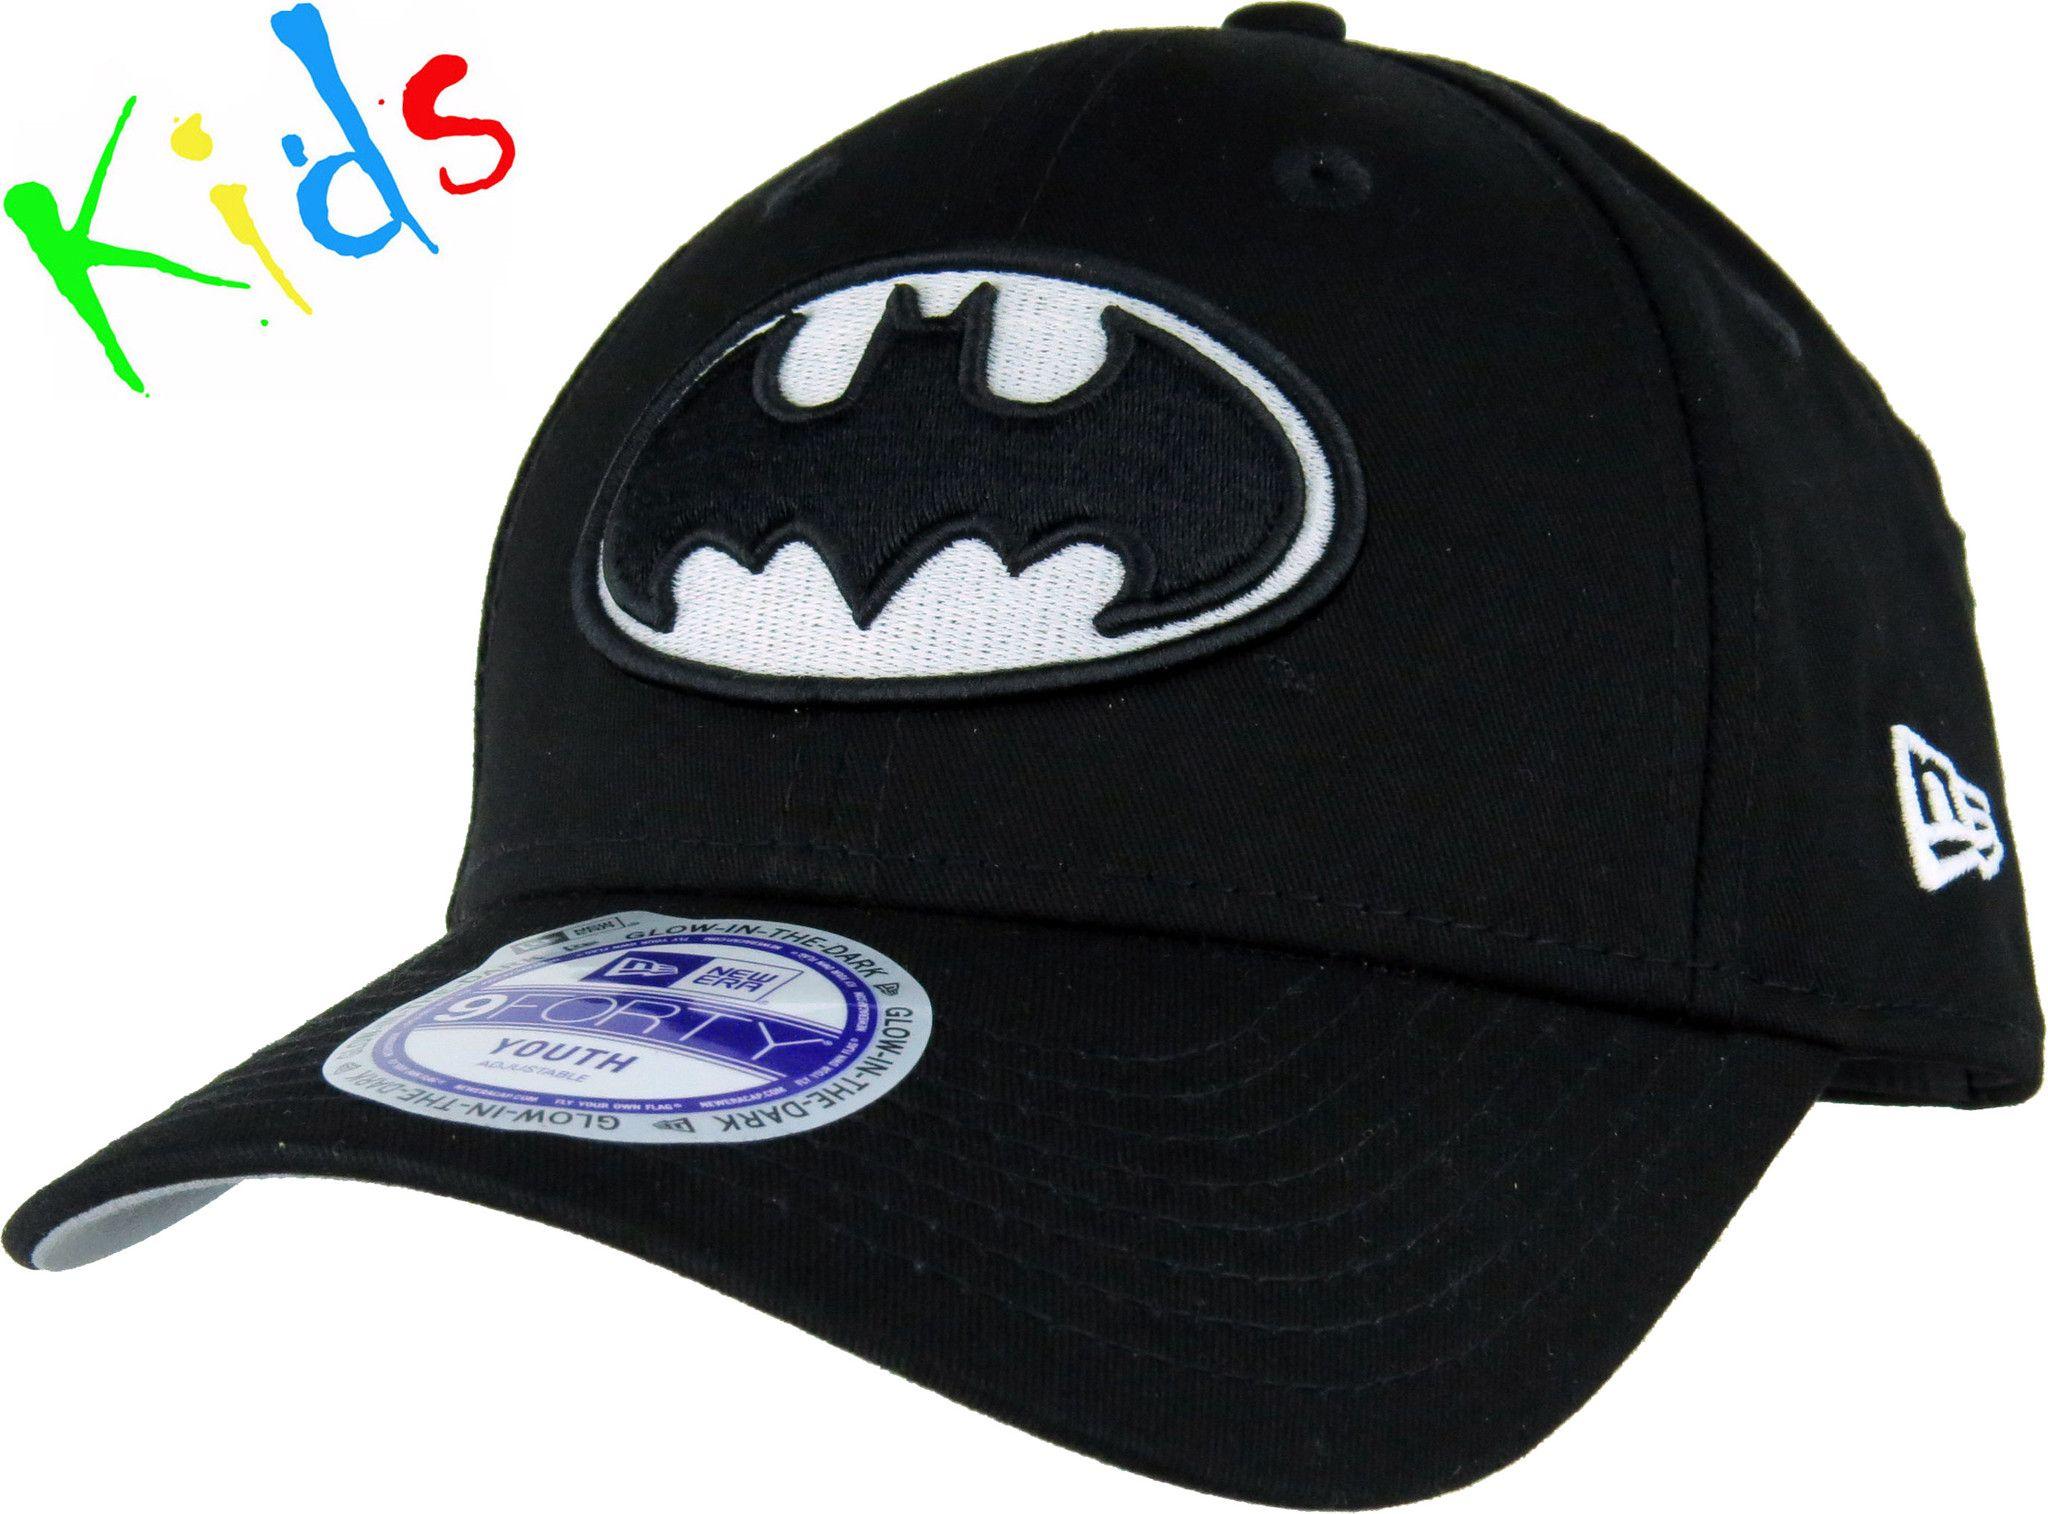 c515a798d48 New Era Kids 940 Glow In The Dark Batman Adjustable Cap - pumpheadgear